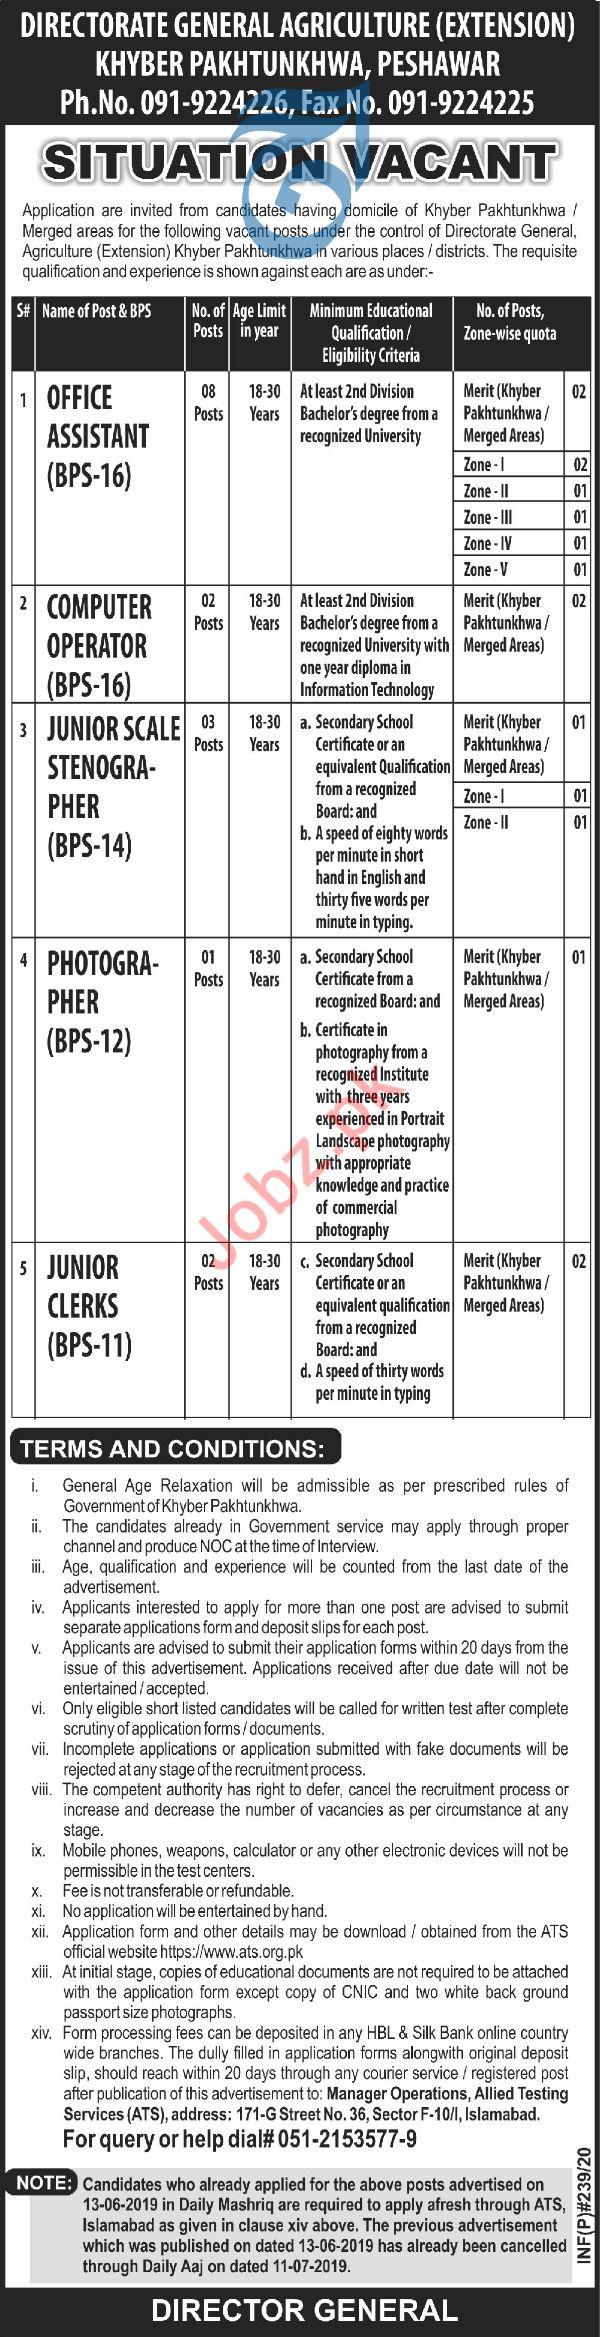 Directorate General Agriculture KpK Jobs 2020 Via ATS